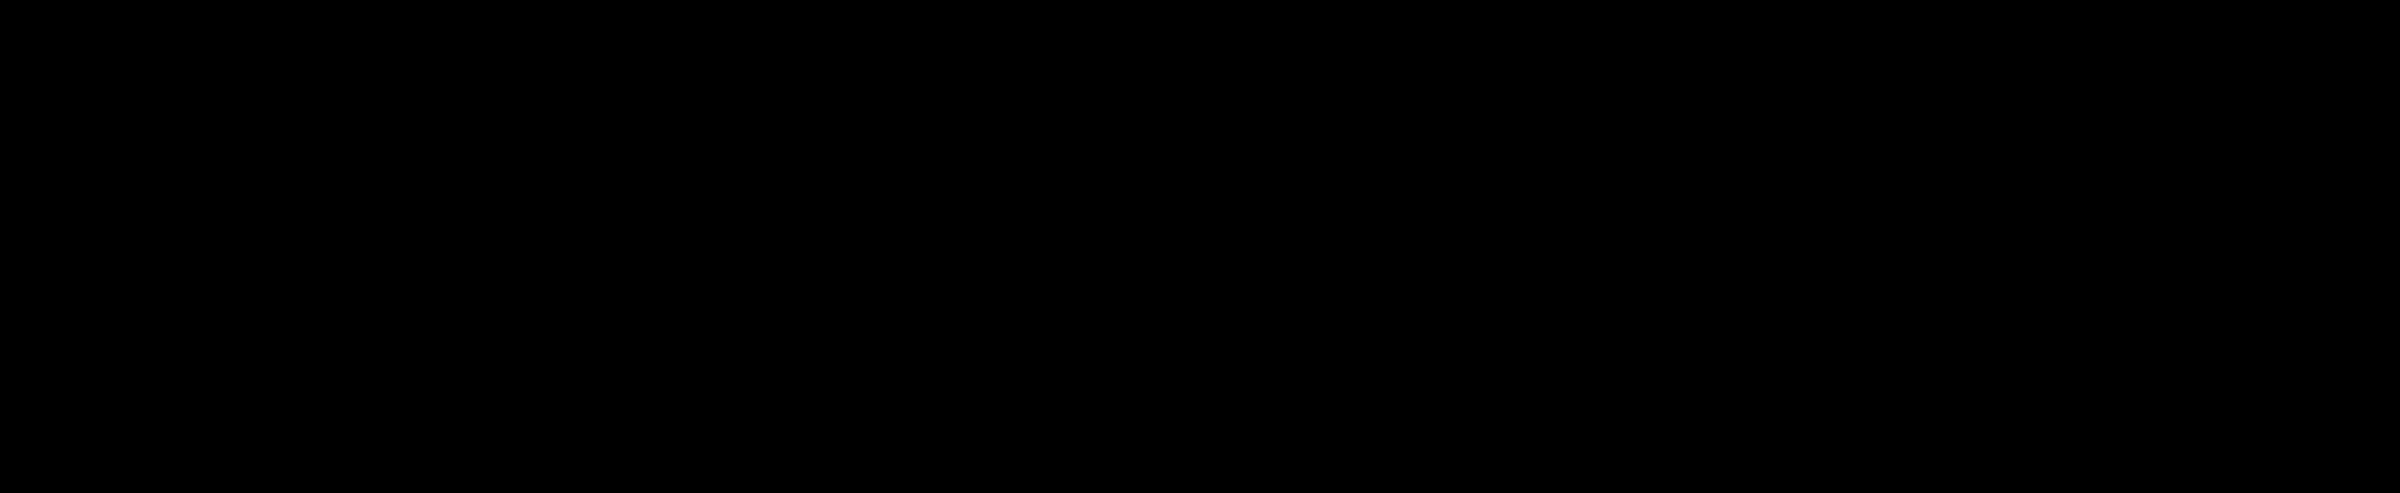 2400x493 Manhattan Skyline Vector Black And White Download Huge Freebie